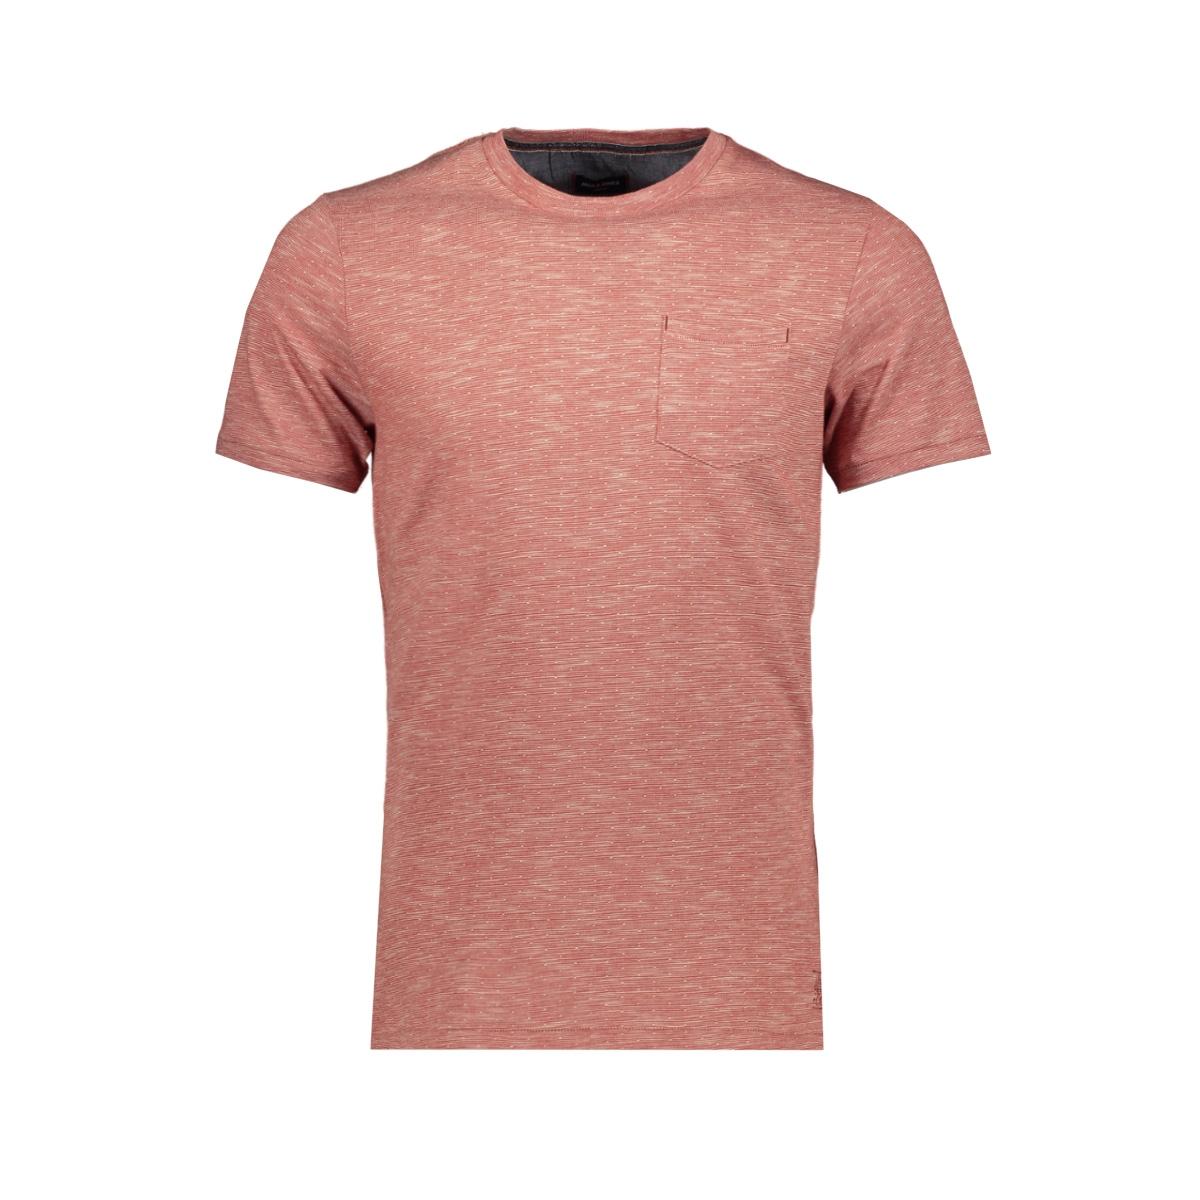 jprpaxon blu. tee ss crew neck 12153494 jack & jones t-shirt ketchup/slim fit